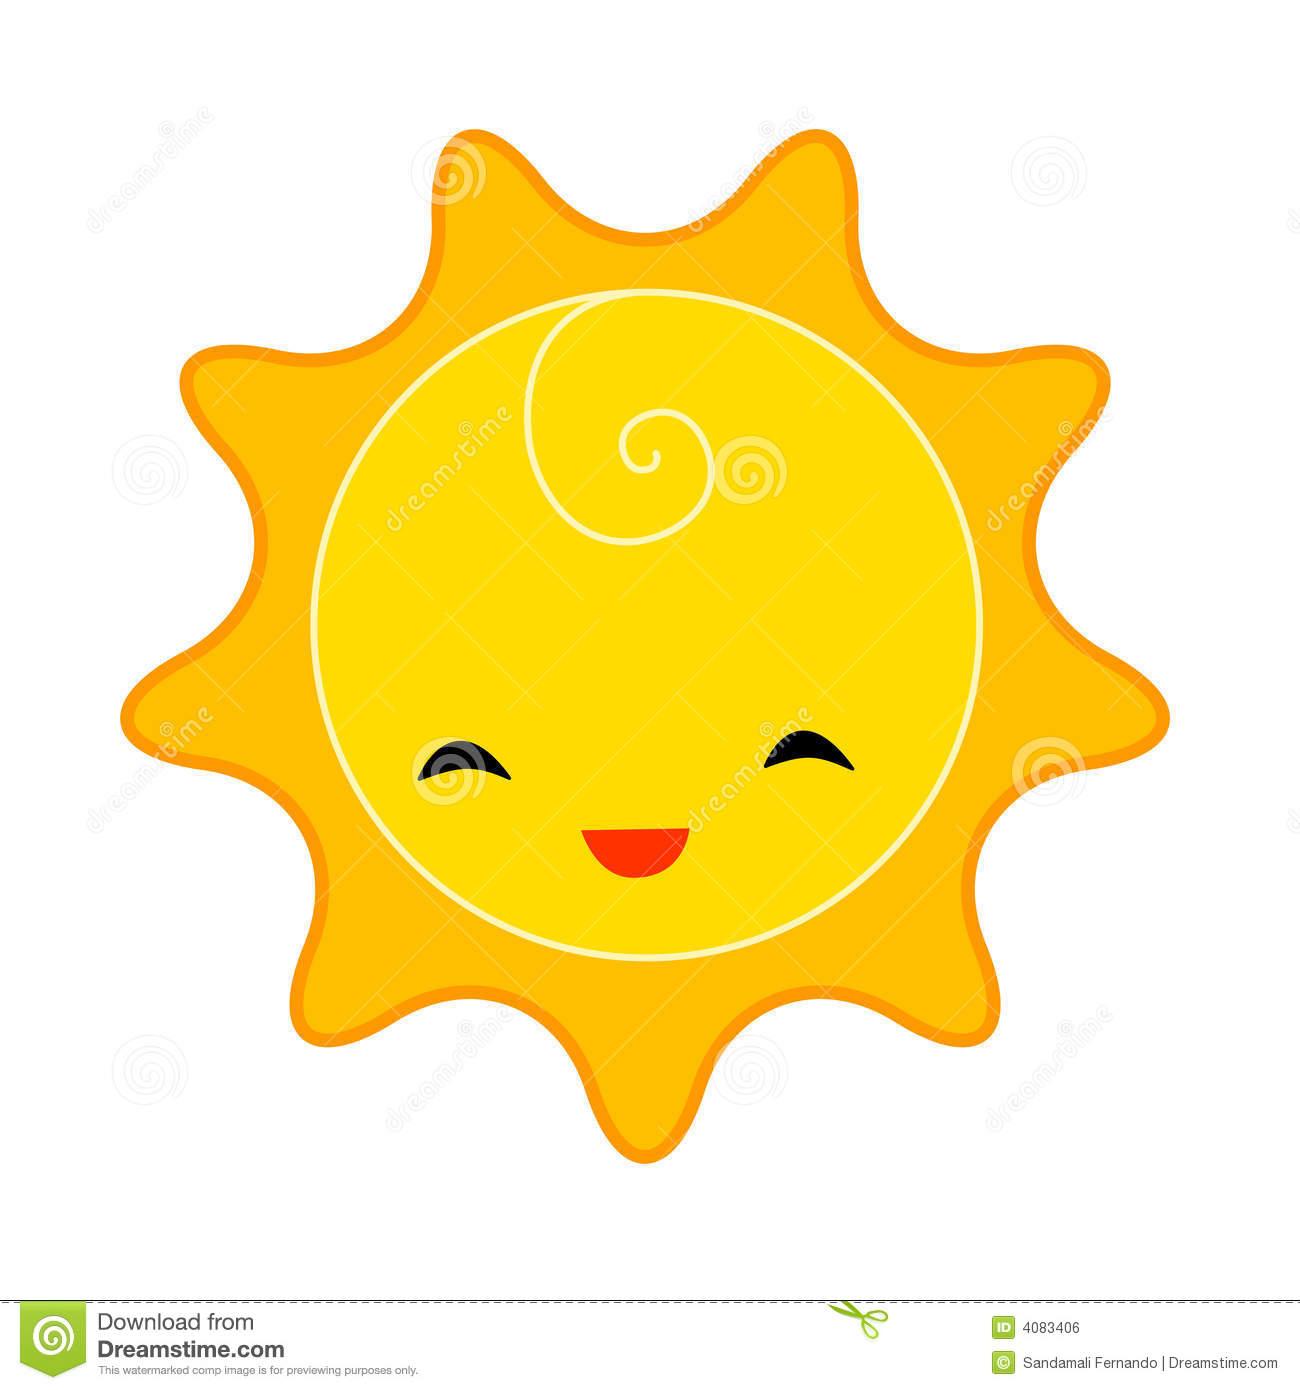 Clipart sunshine copyright free. Orange sun download best